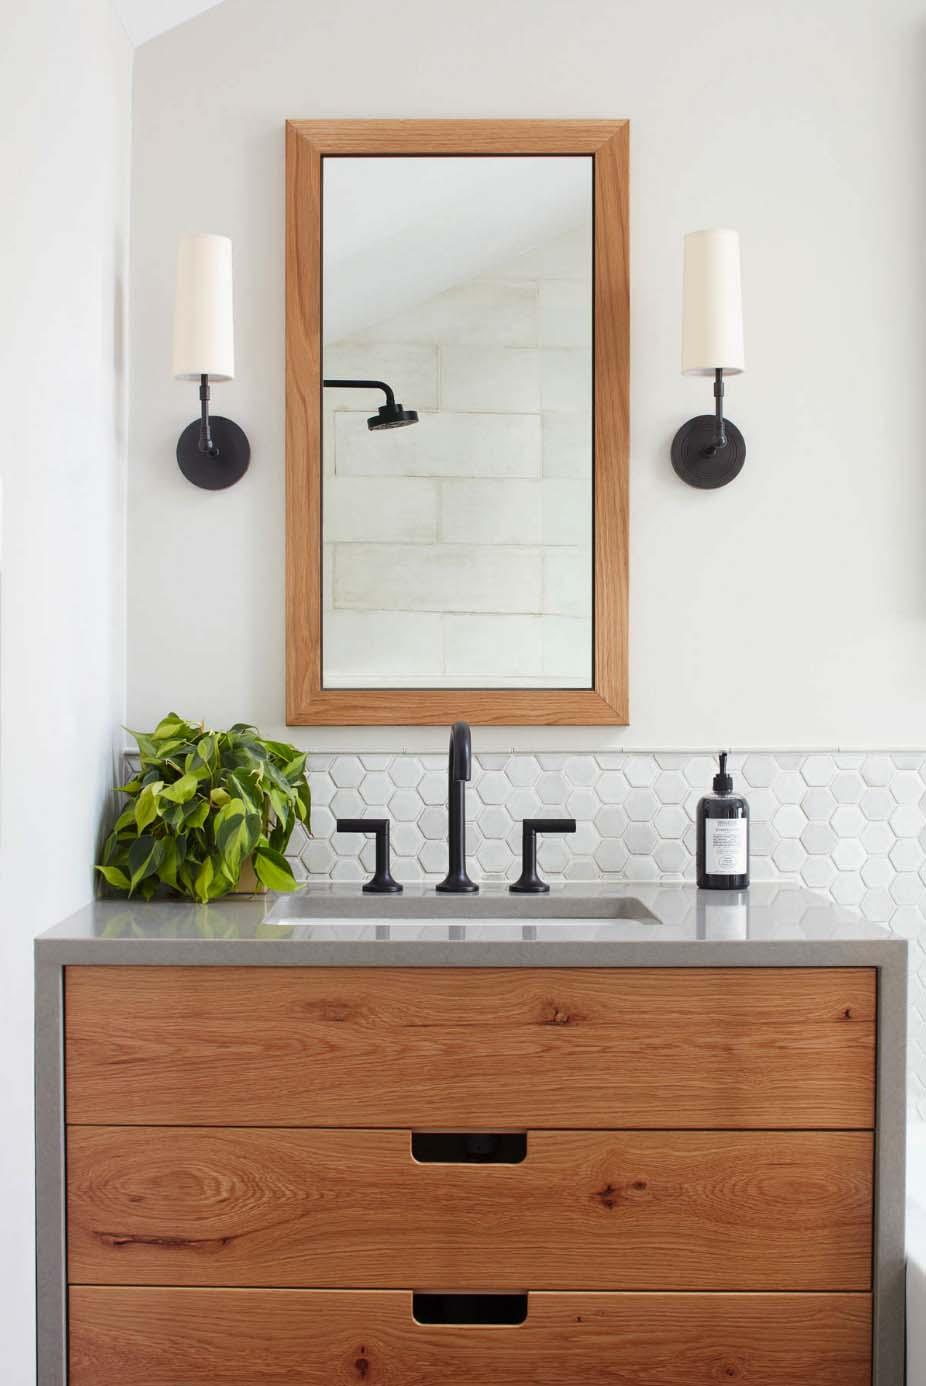 Coastal Style Interiors-Kristina Crestin Design-12-1 Kindesign